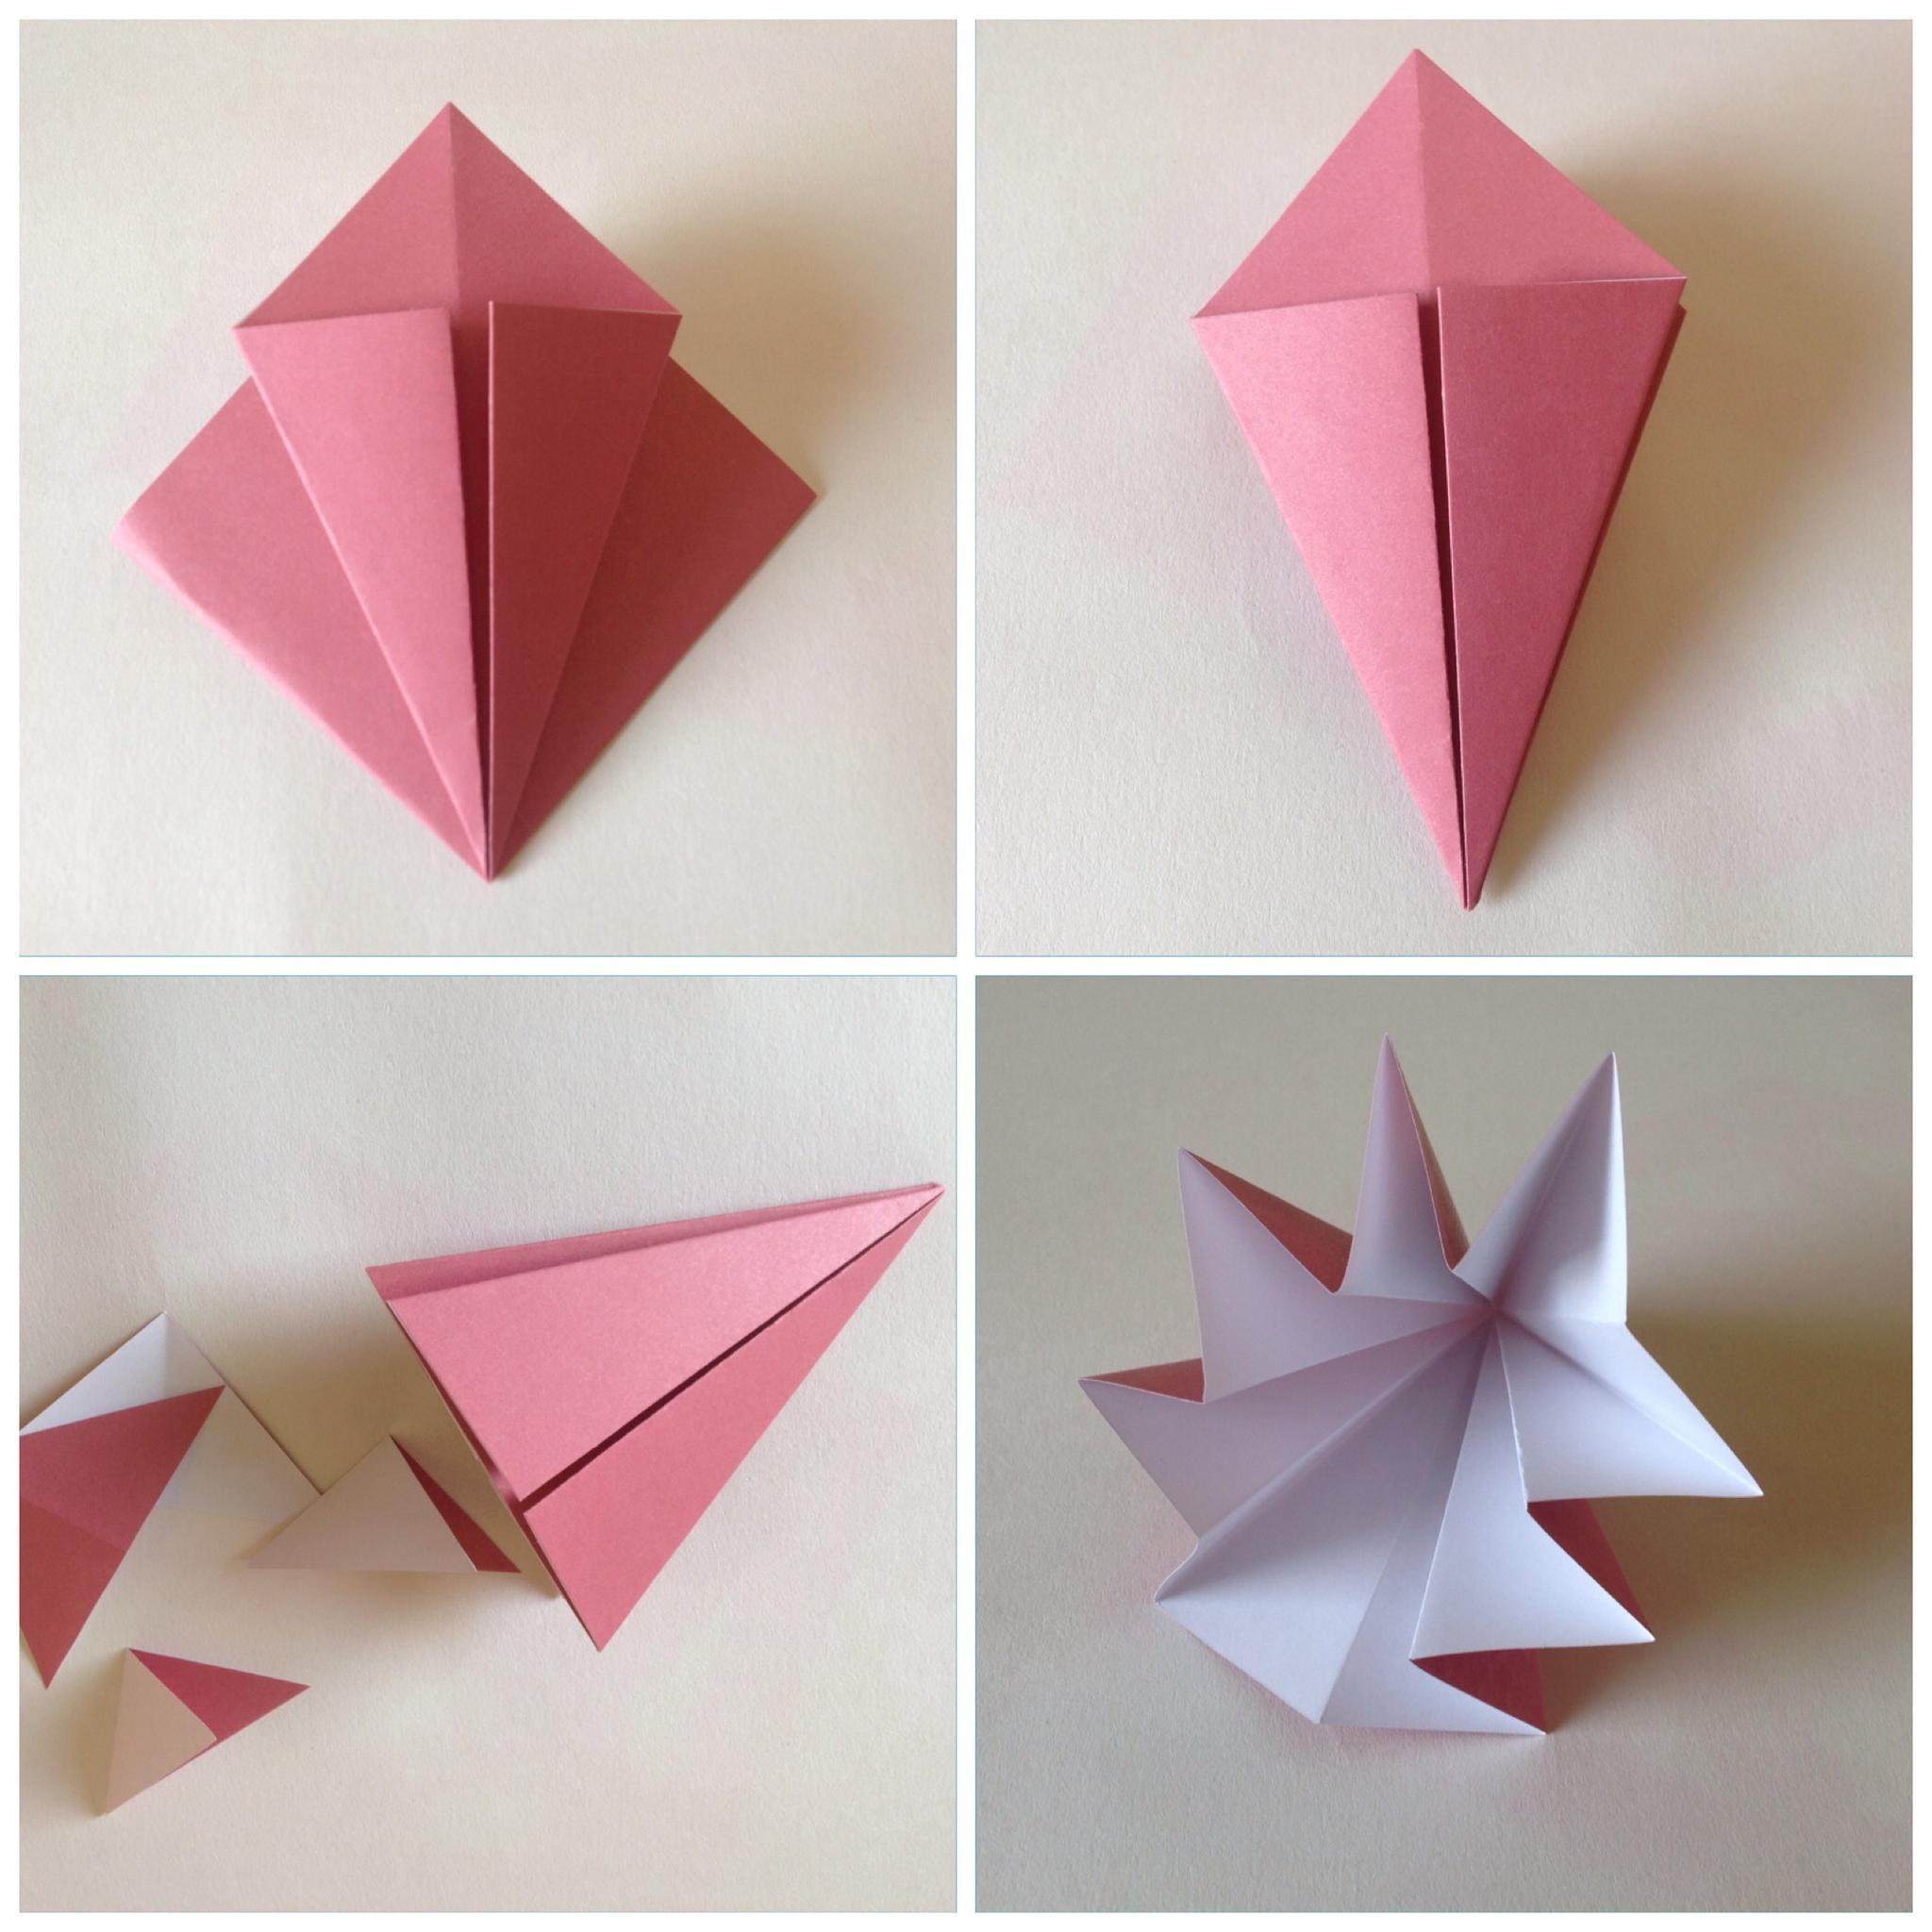 Мобиль оригами-обрежьте нижний край